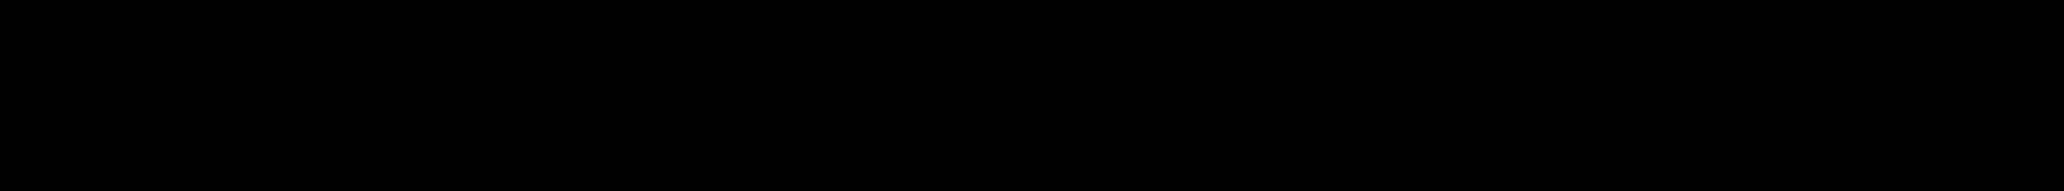 Contra Sans Light Italic